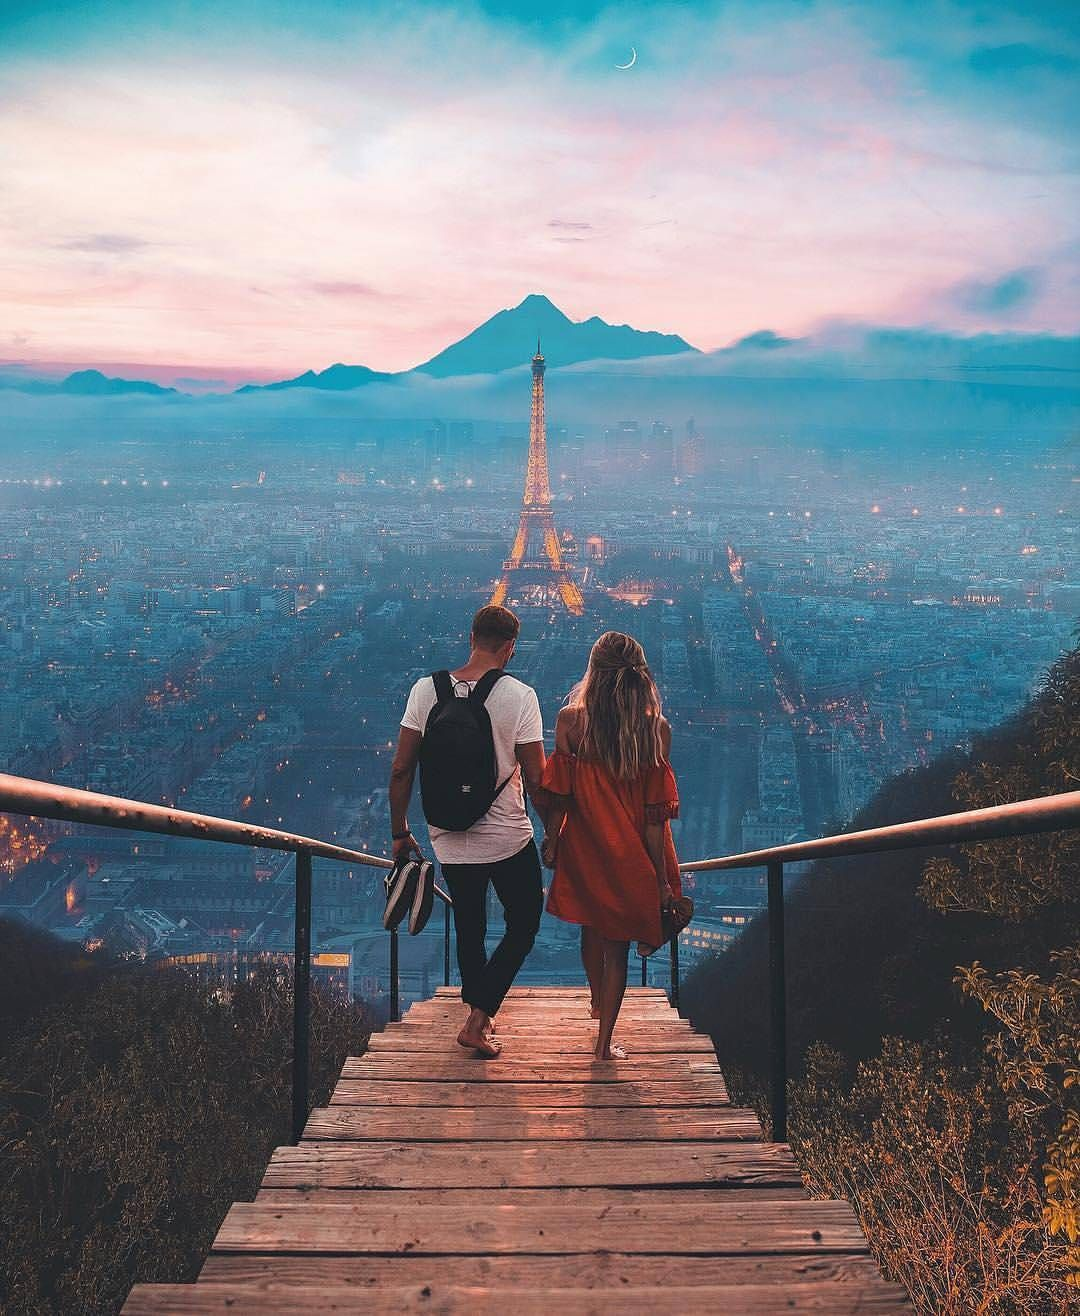 Pinterest: @vandanabadlani // Elegant Romance, Cute Couple